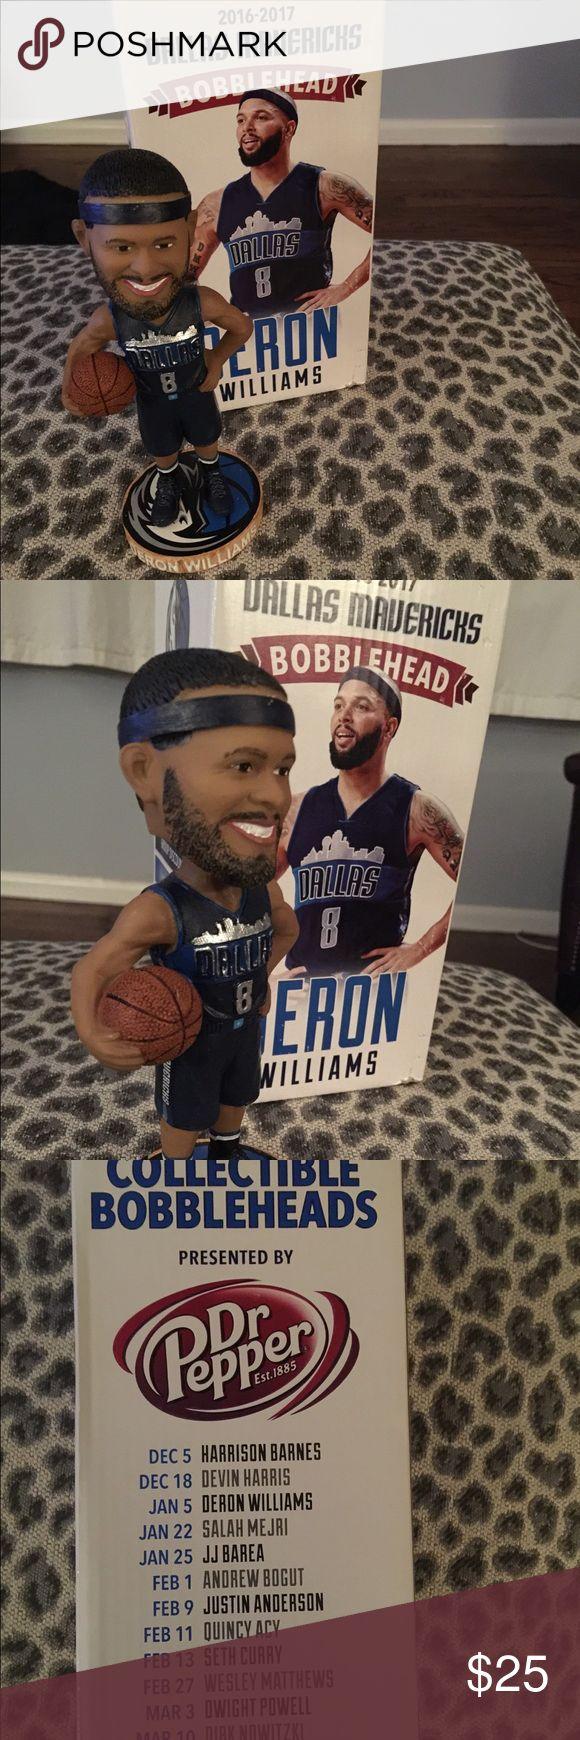 Dallas Mavericks Deron Williams Bobble Head 2016-2017 Dallas Mavericks Deron Williams Bobble Head... Still in box.. #8 dallas Mavericks Other